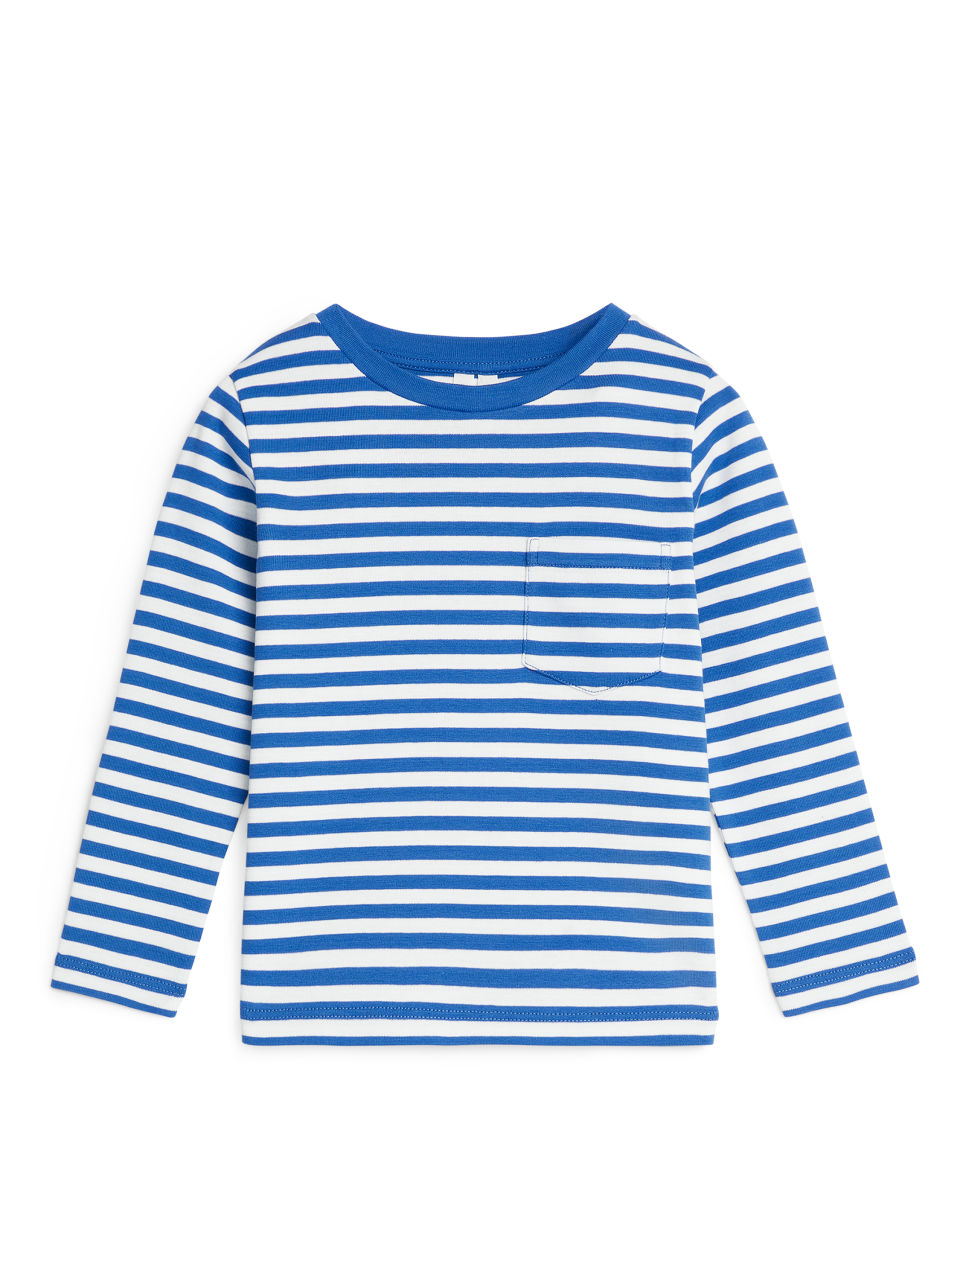 Striped Long Sleeve - Blue